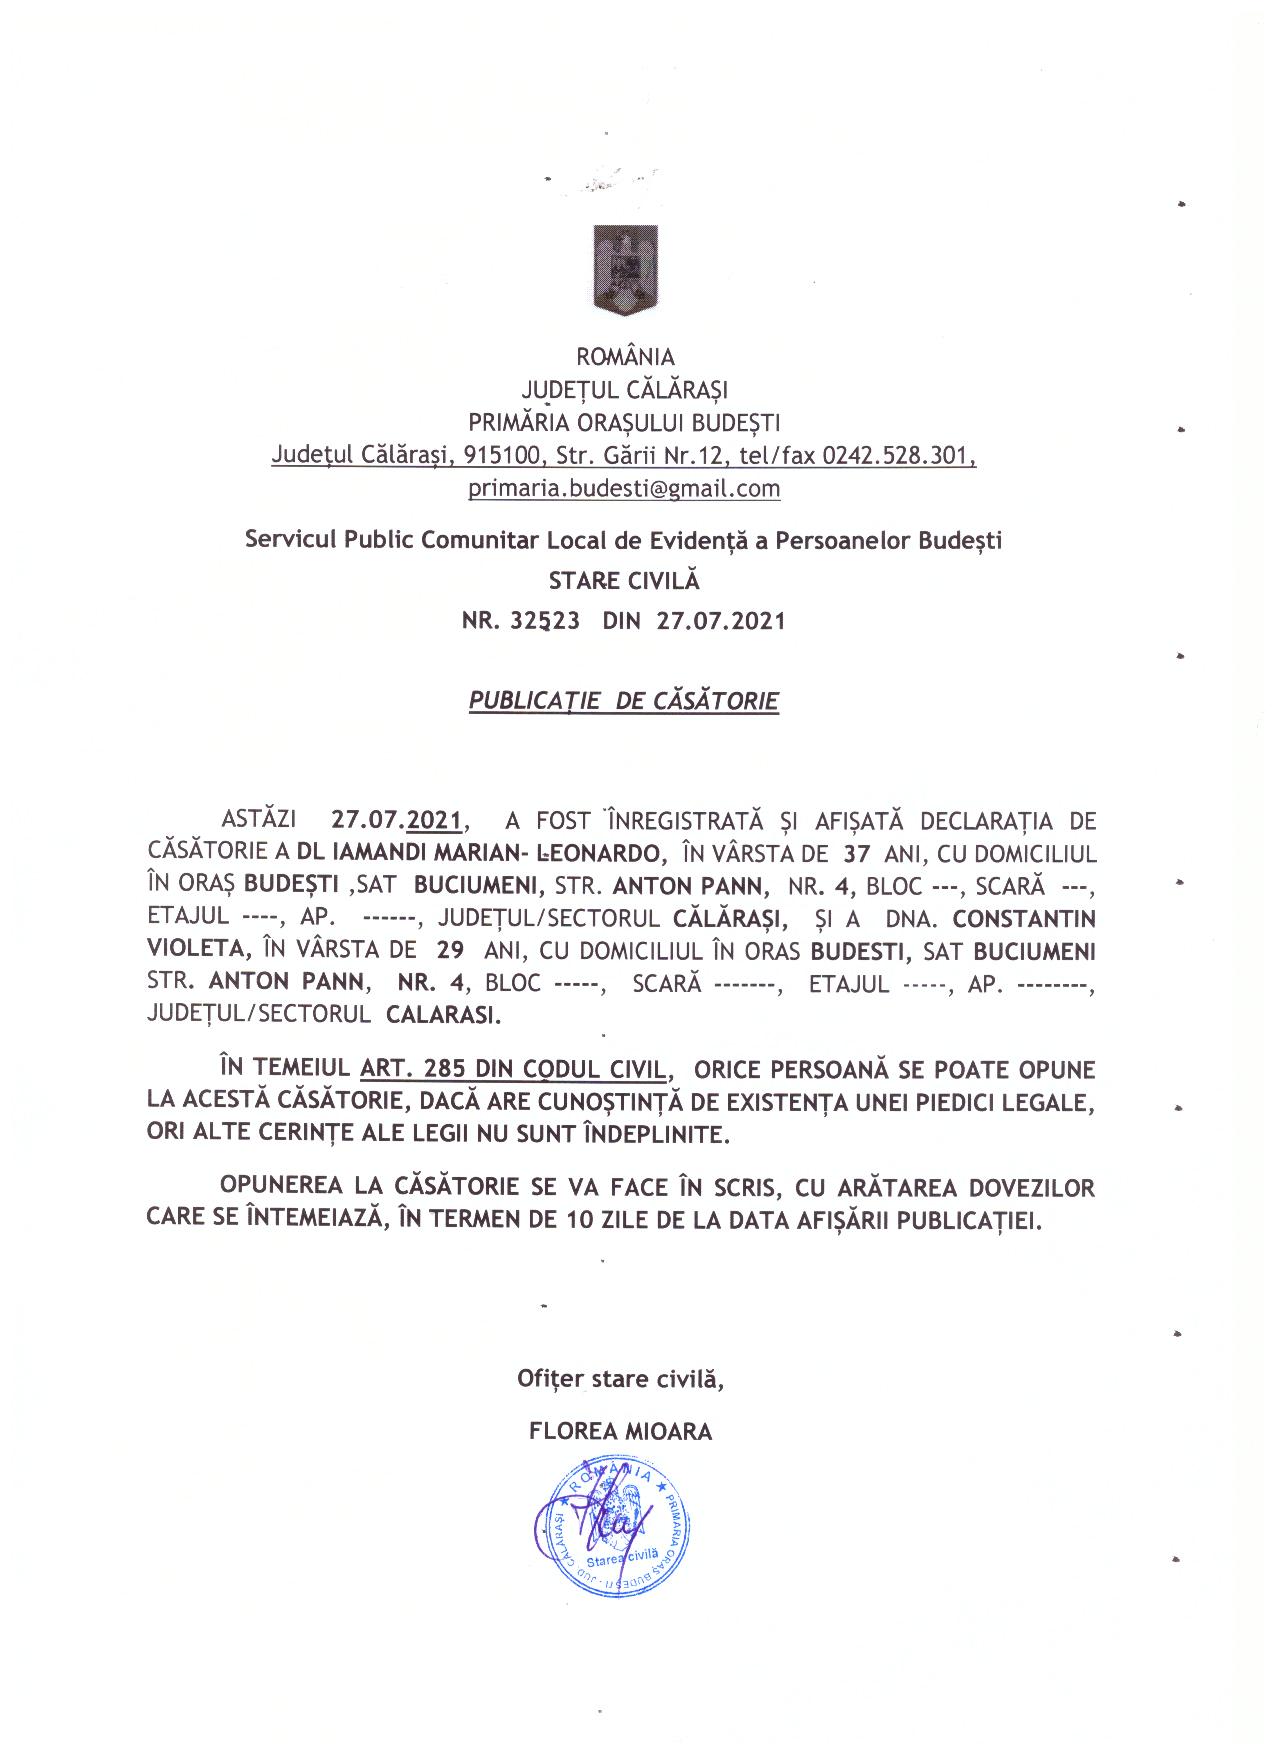 publicatie de casatorie iamandi marian -leonardo